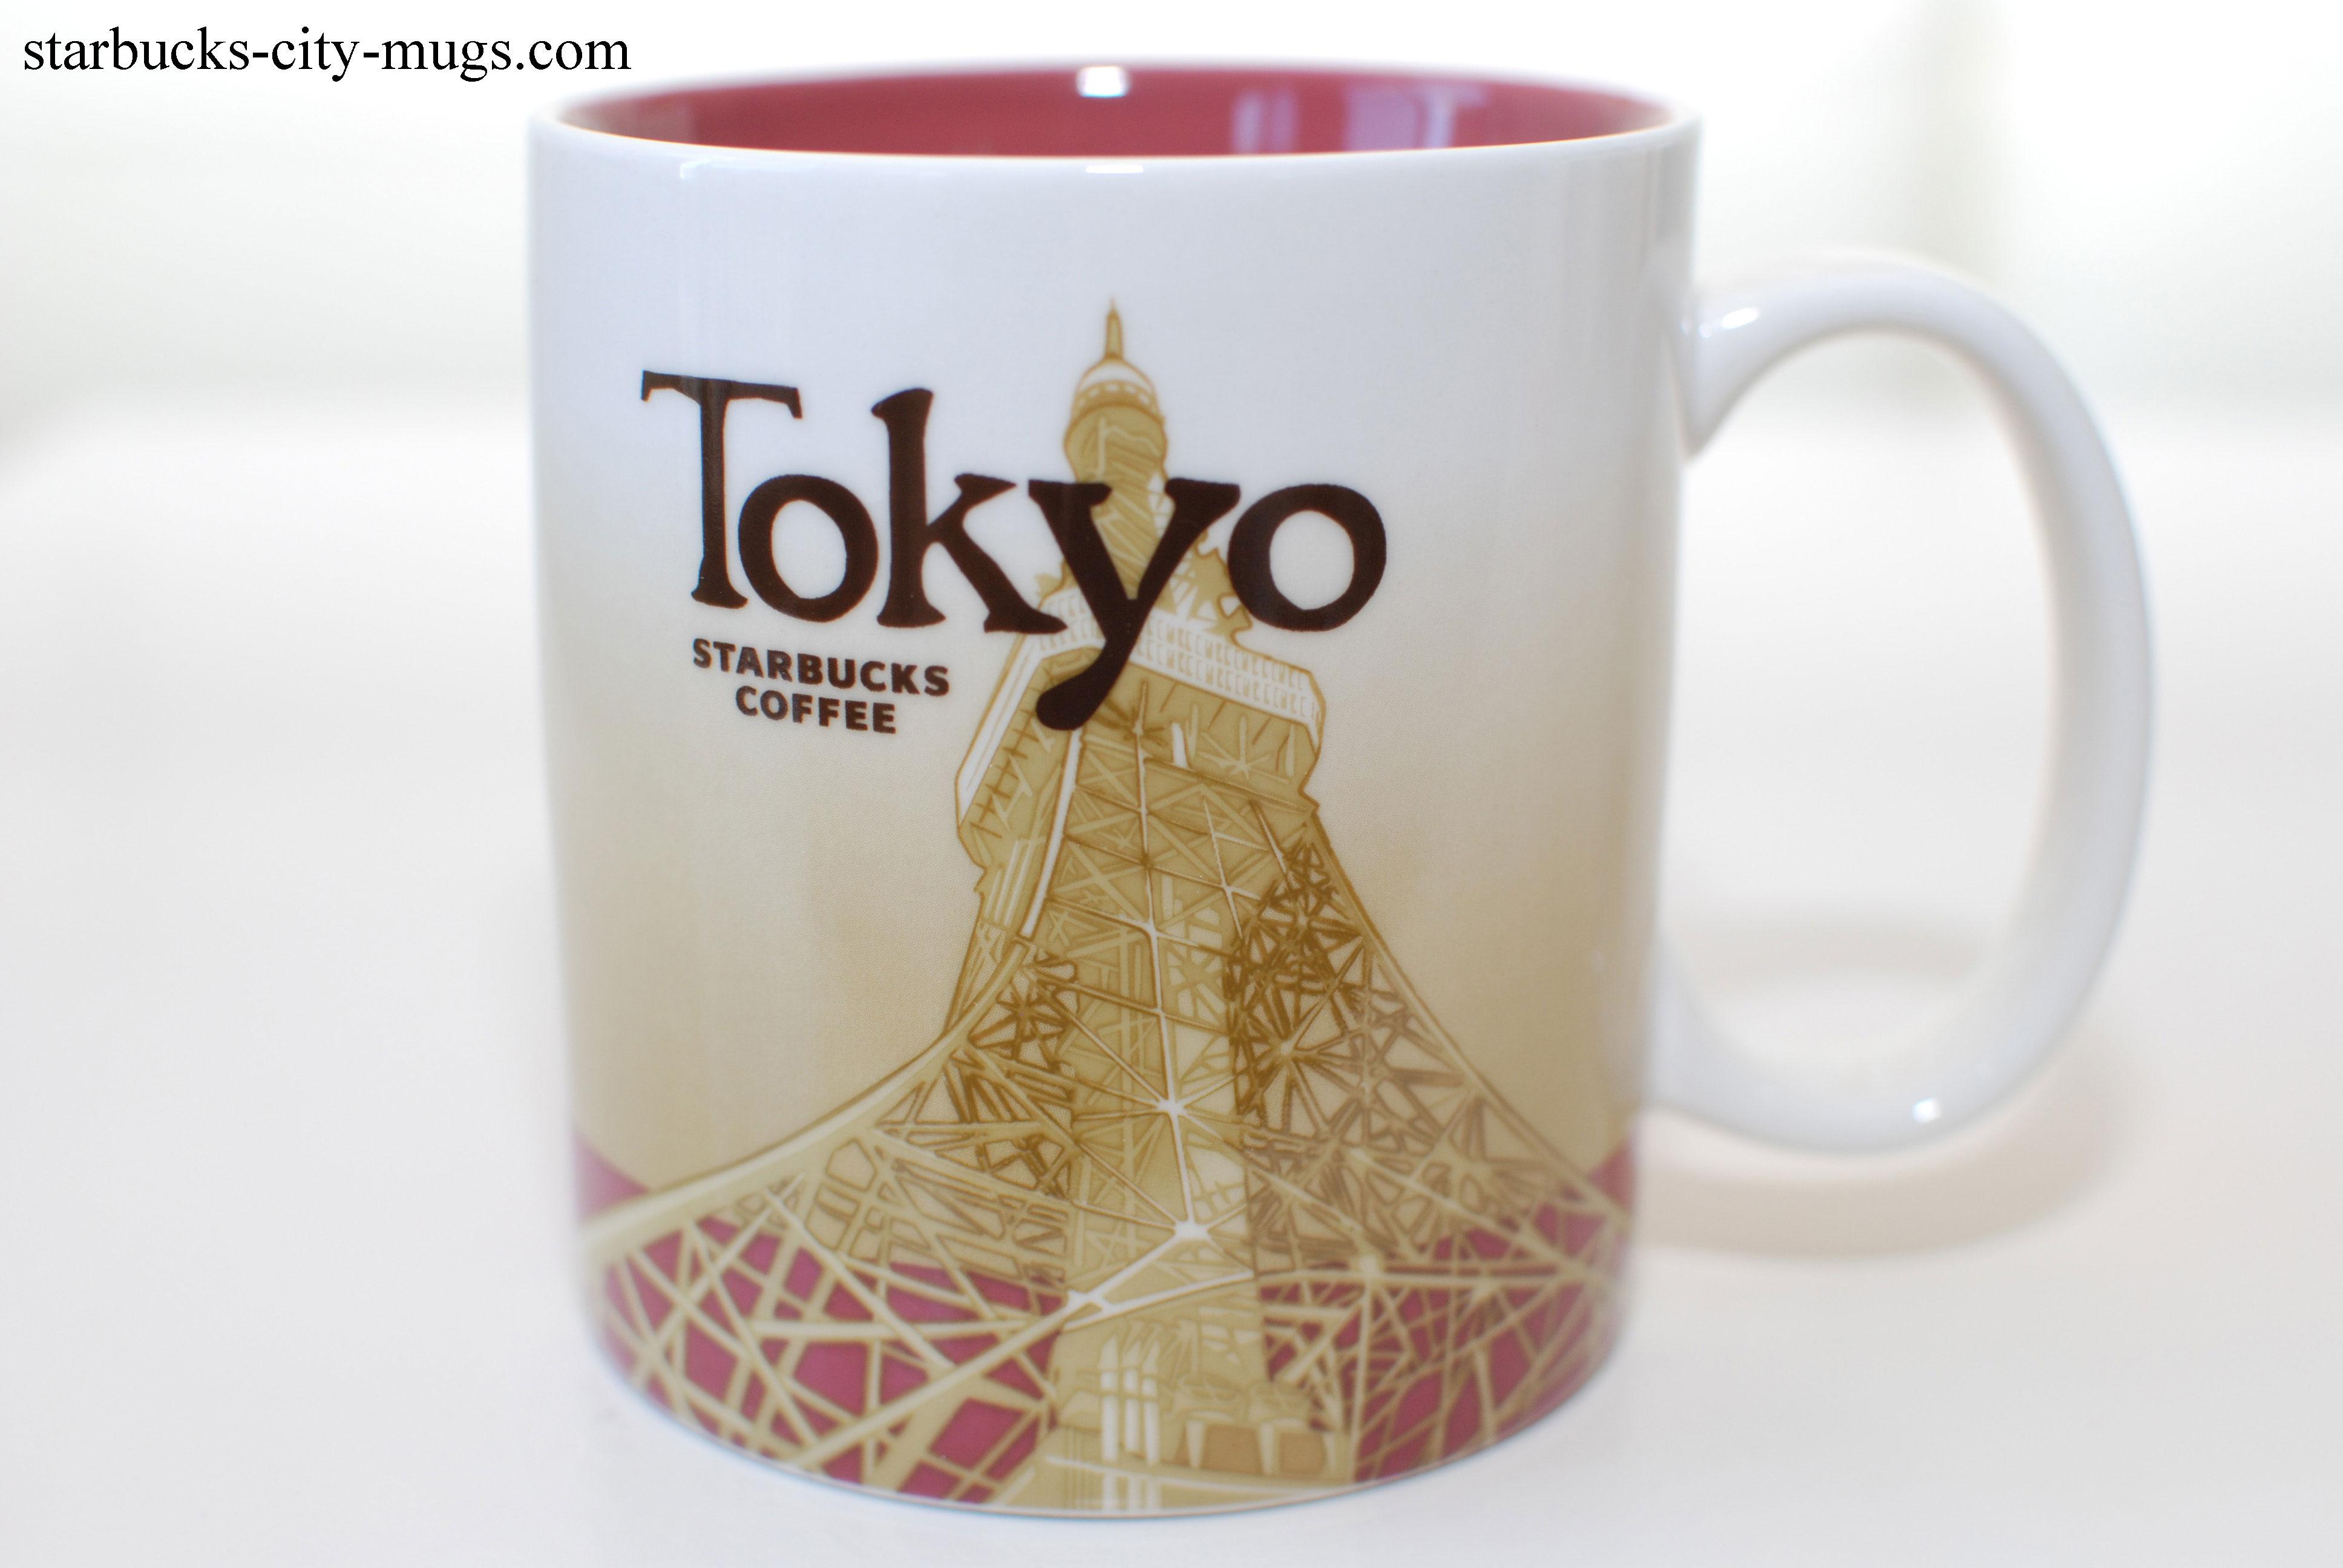 Cute Coffee Mugs Tokyo Starbucks City Mugs